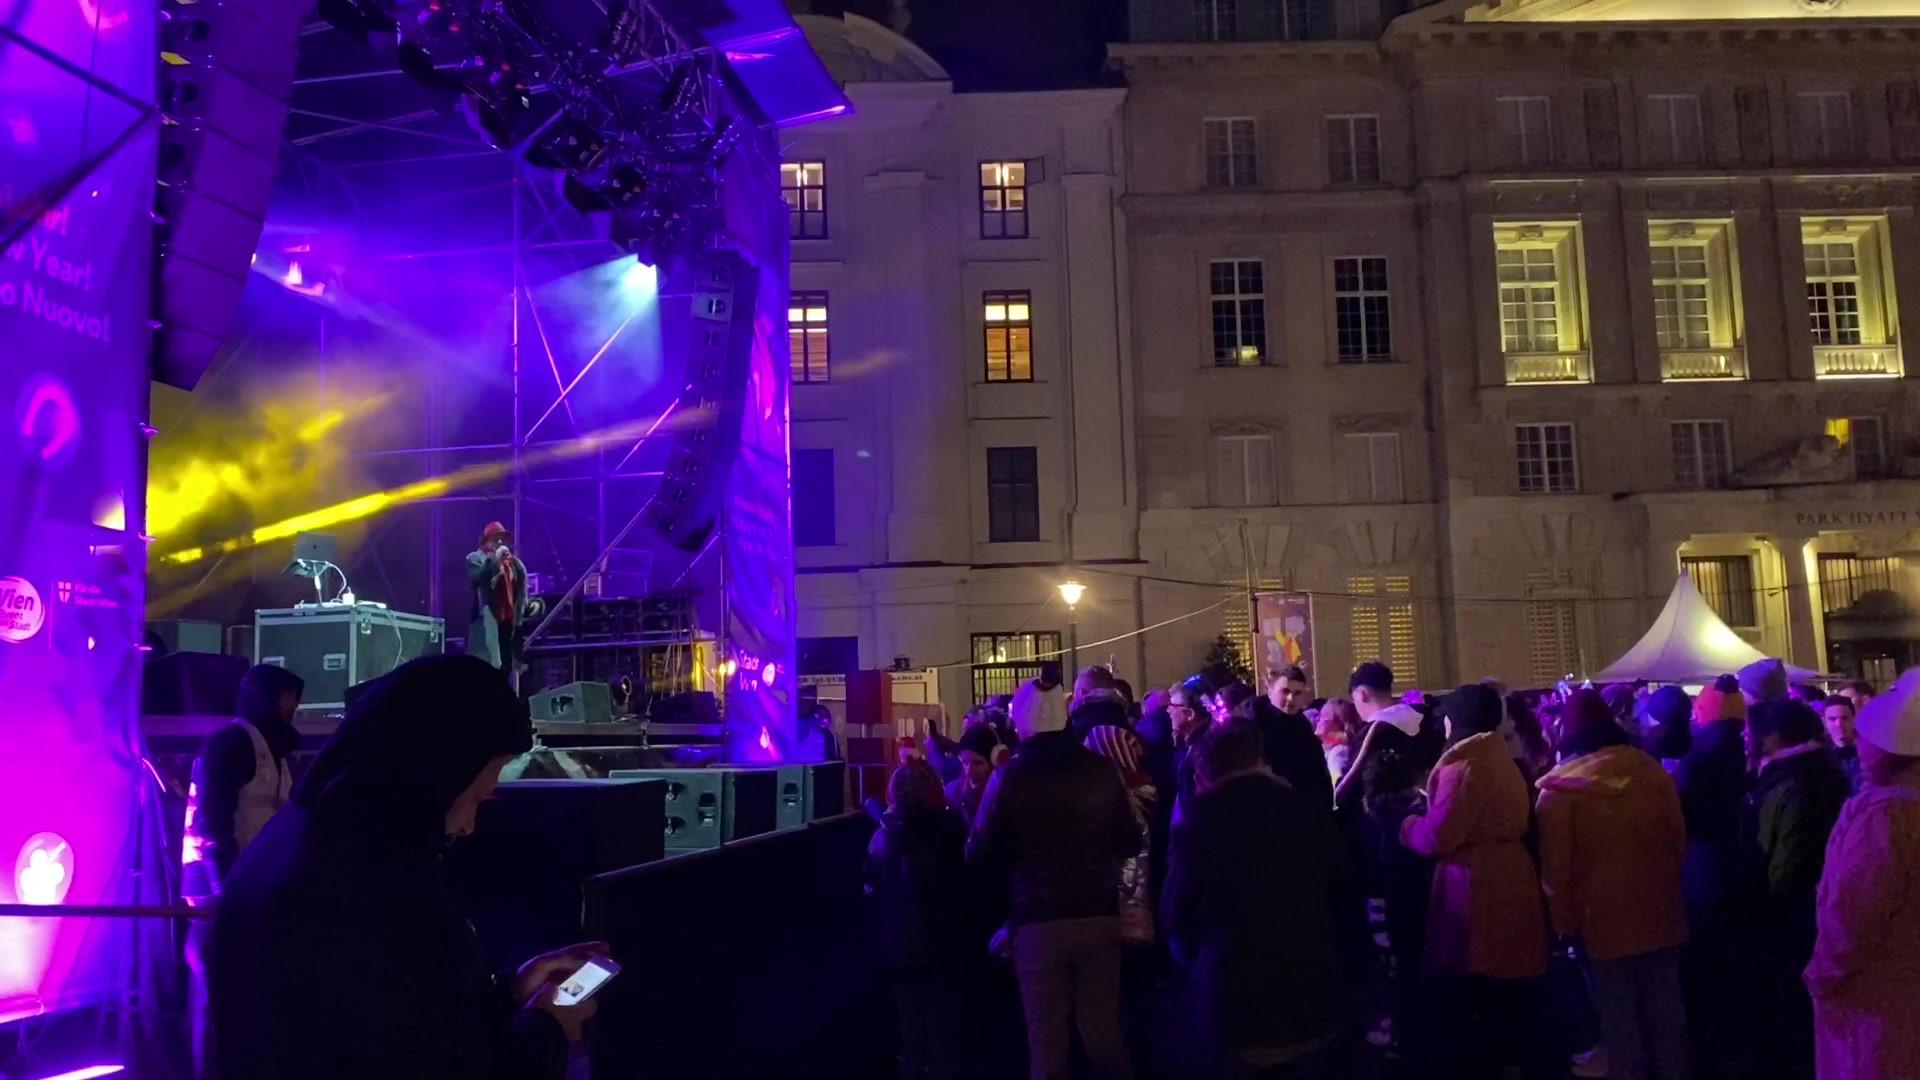 Silvesterpfad 2019 Live am Hof